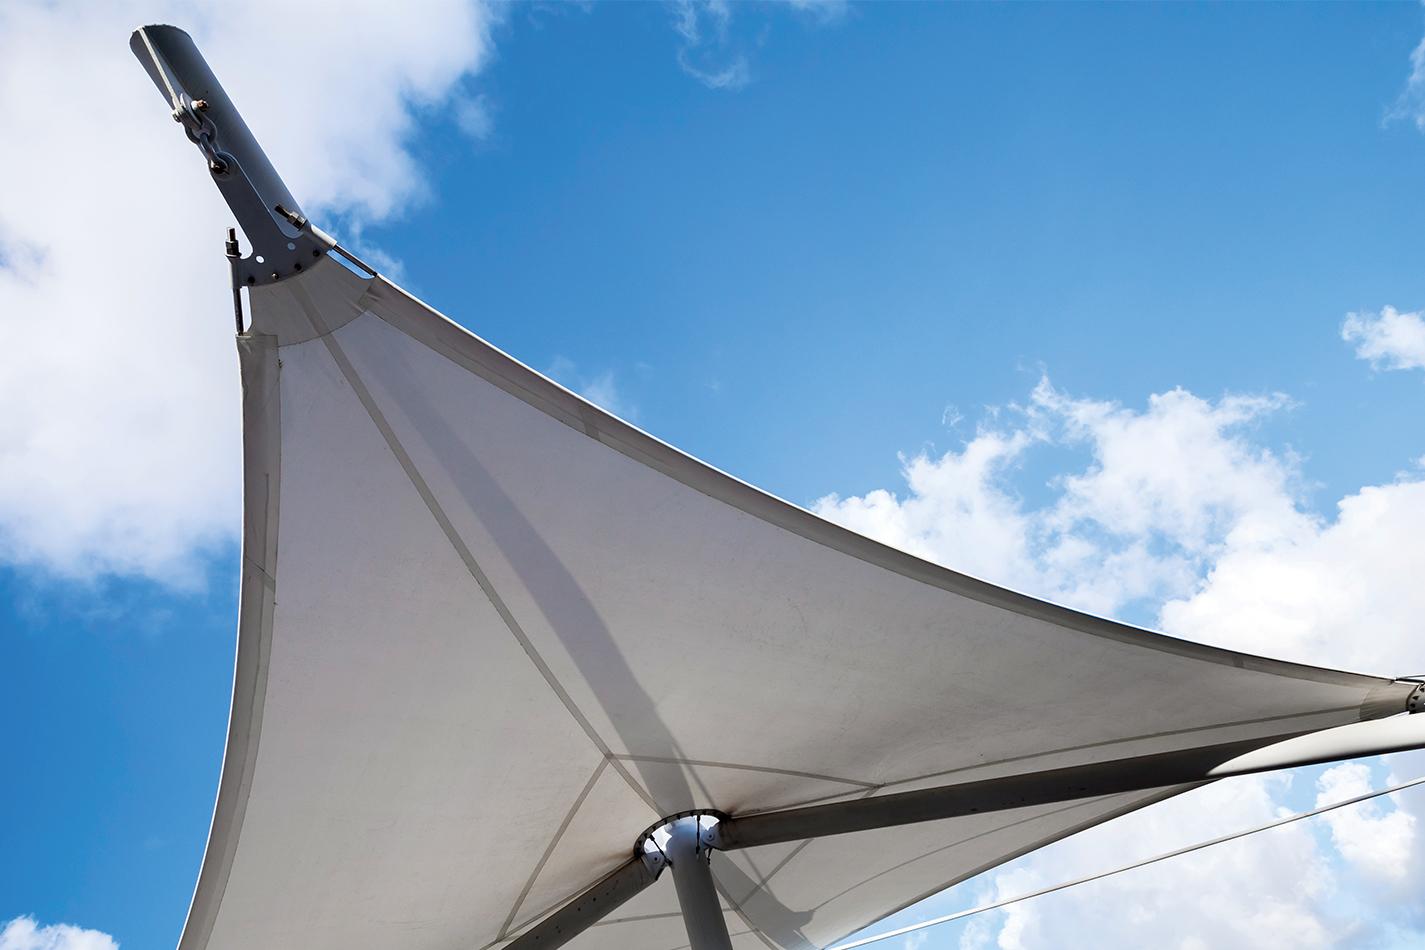 royal-blinds-retractable-sails-2